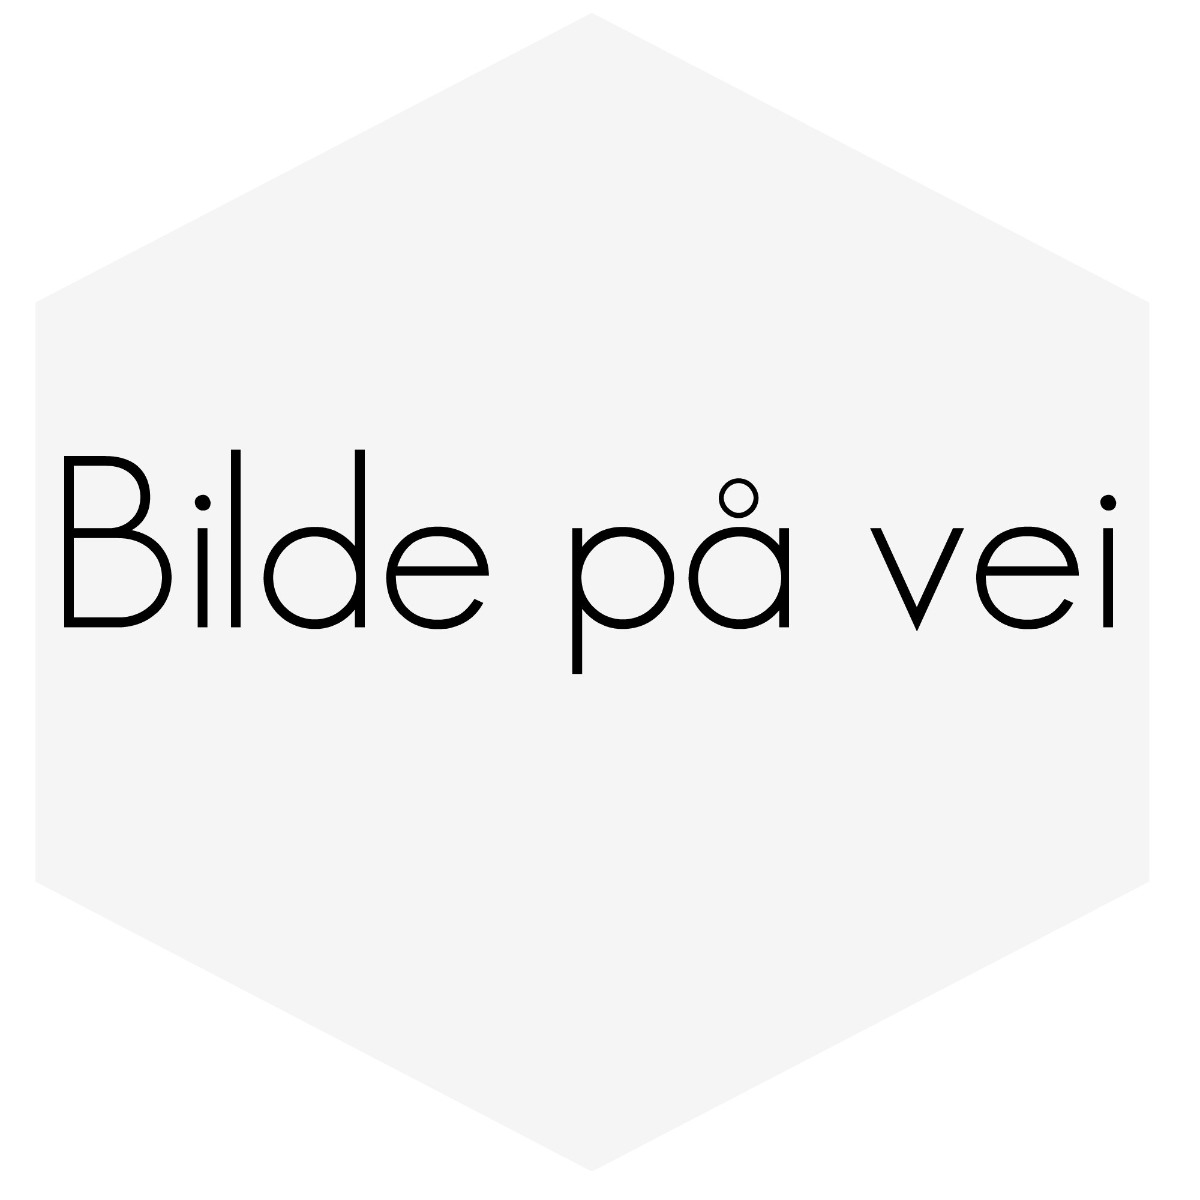 "SILIKONSLANGE RØD REDUSERING 2,25-2,75"" (57-70MM)"